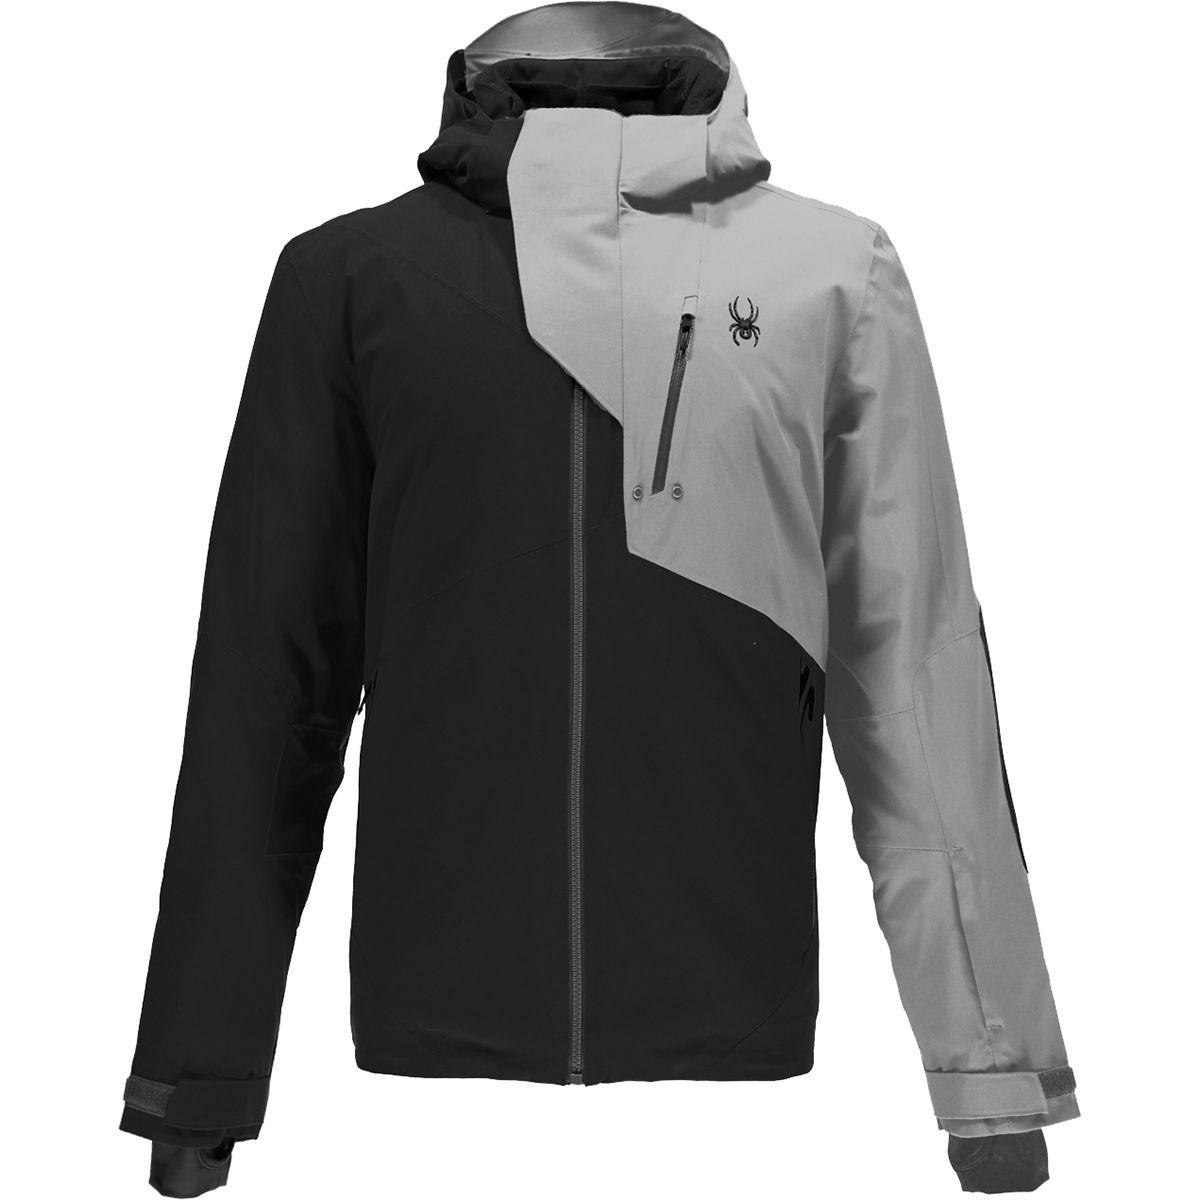 Spyder Cordin Jacket - Men